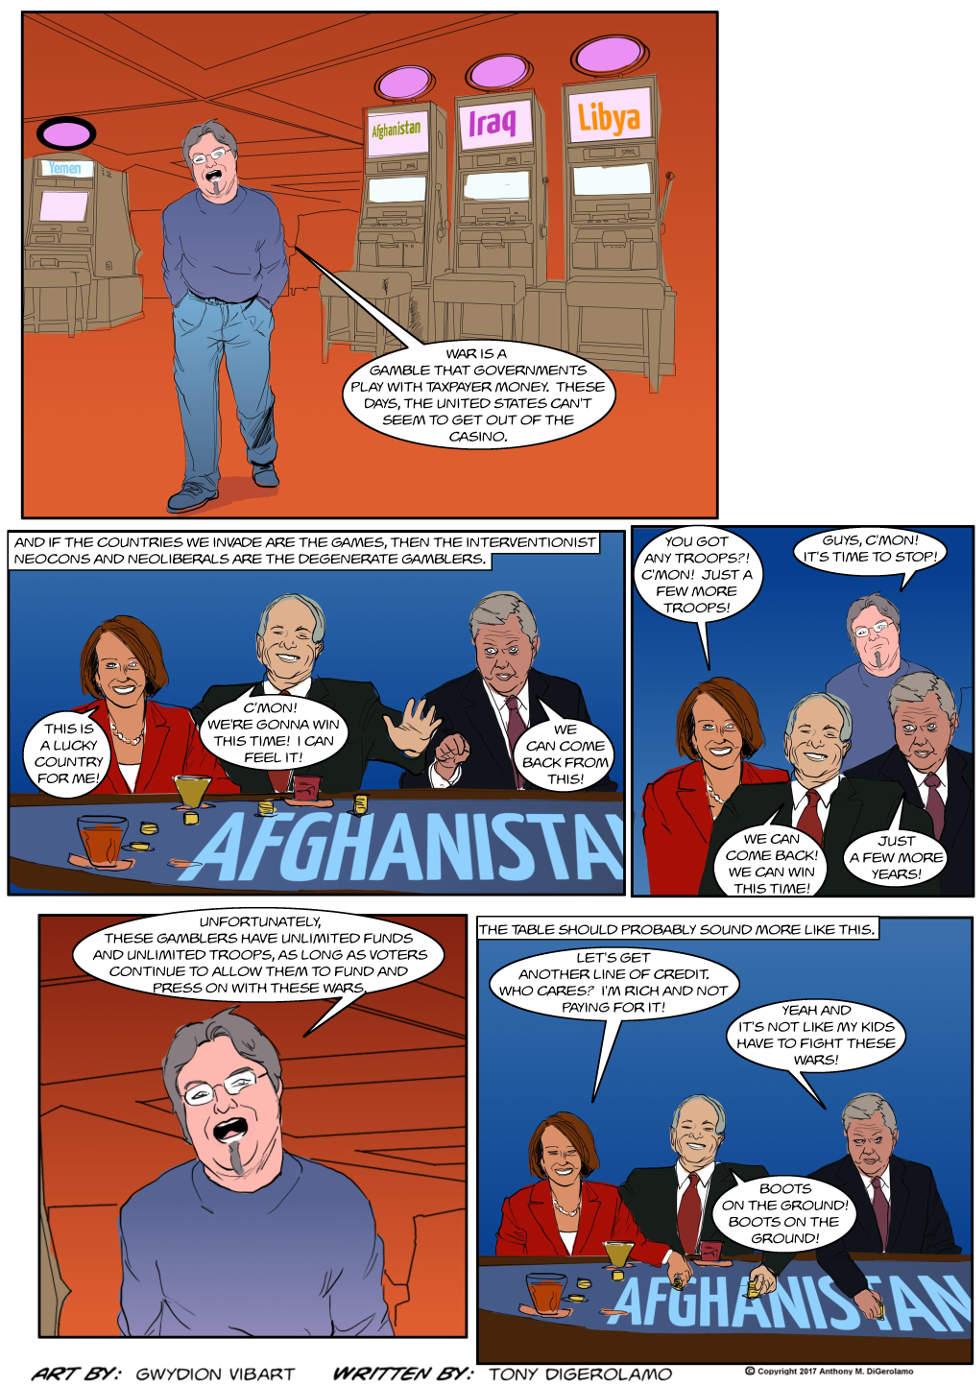 The Antiwar Comic:  Degenerate Interventionists